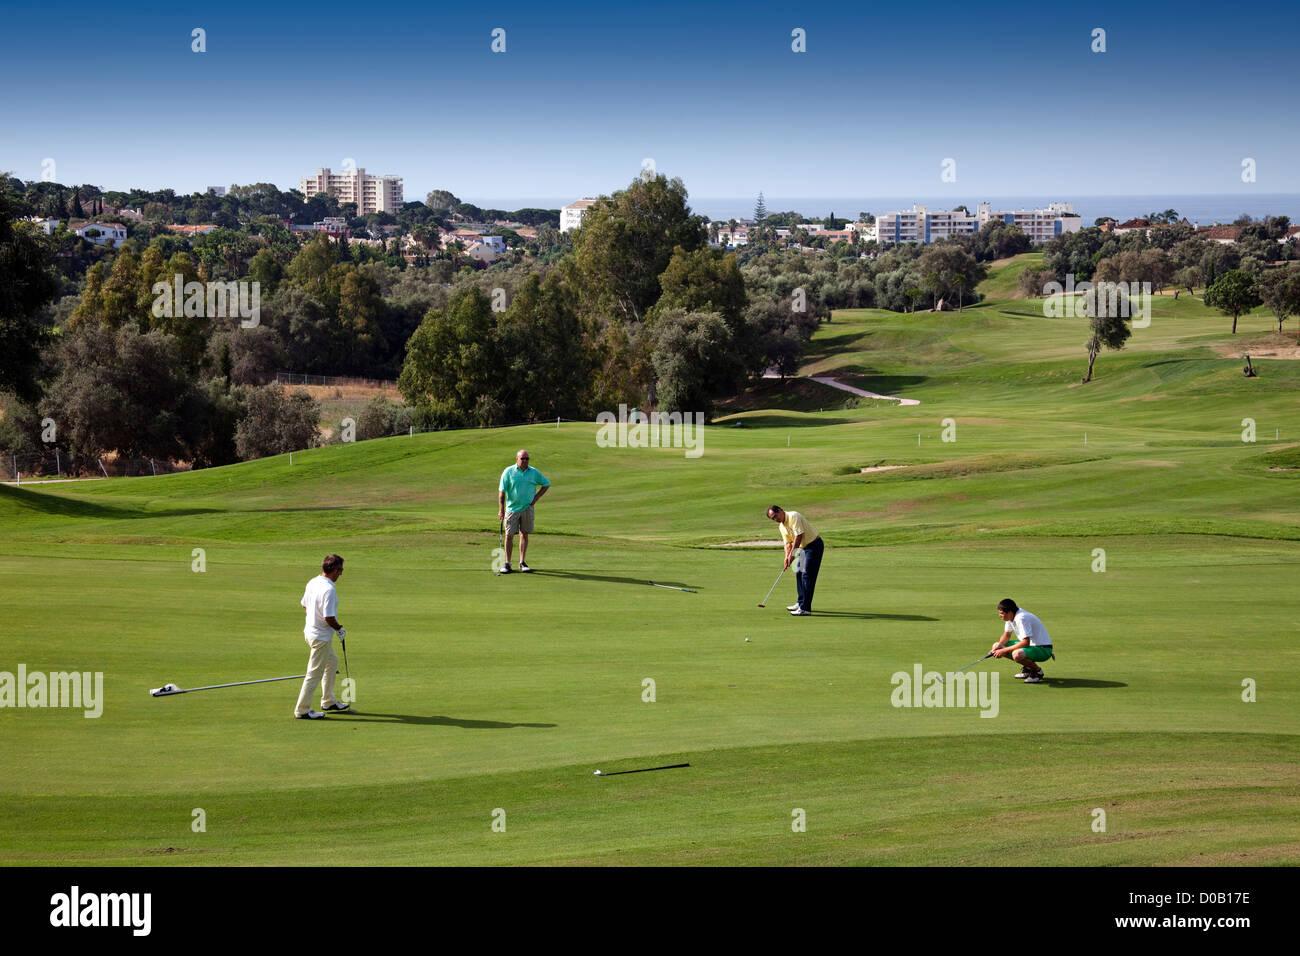 Marbella Club Golf Málaga Costa del Sol Andalucía España Imagen De Stock